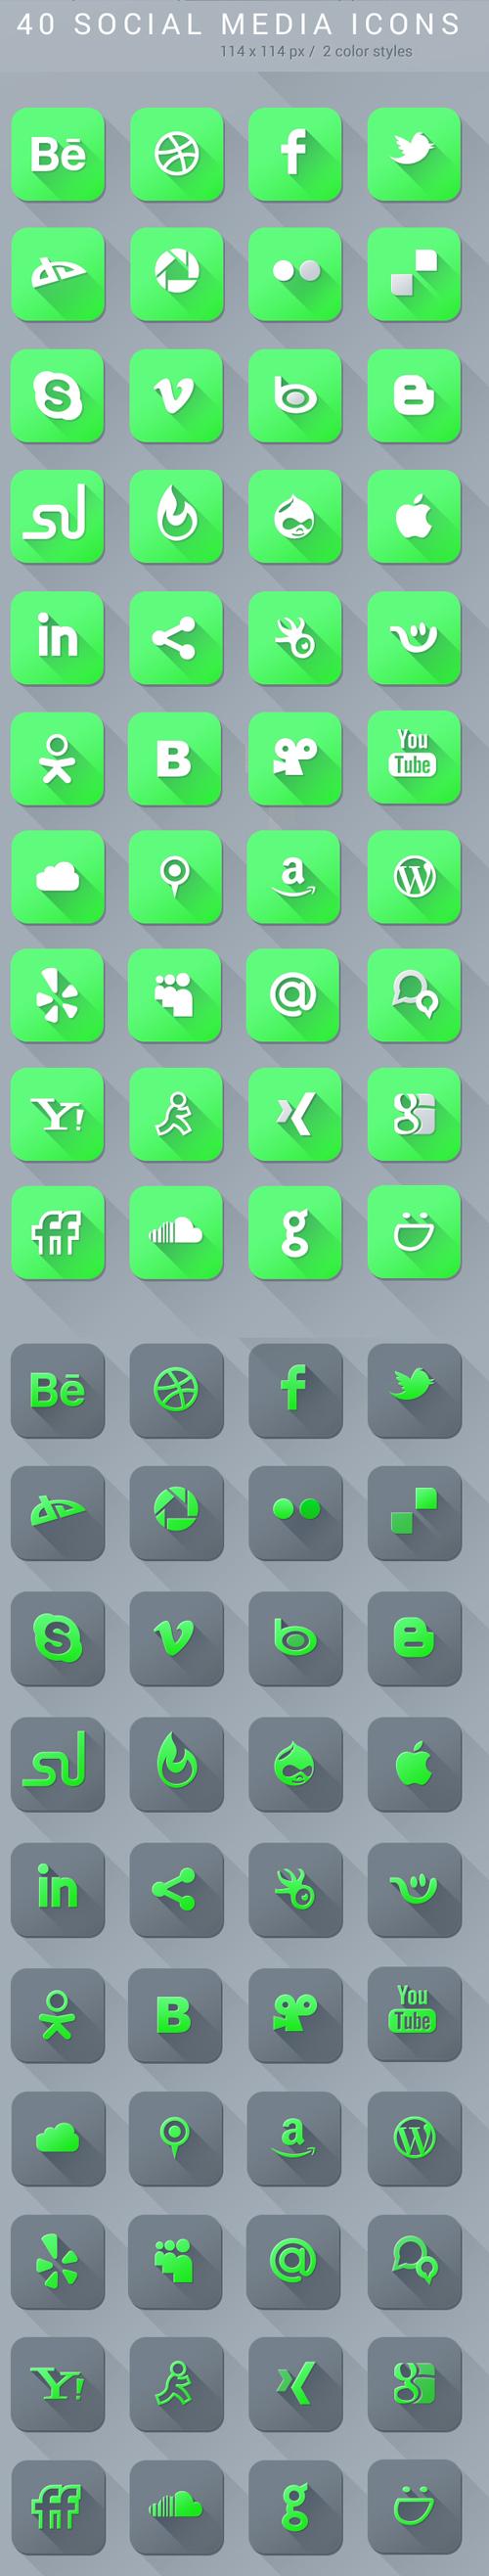 Free Social Media Icons PSD File